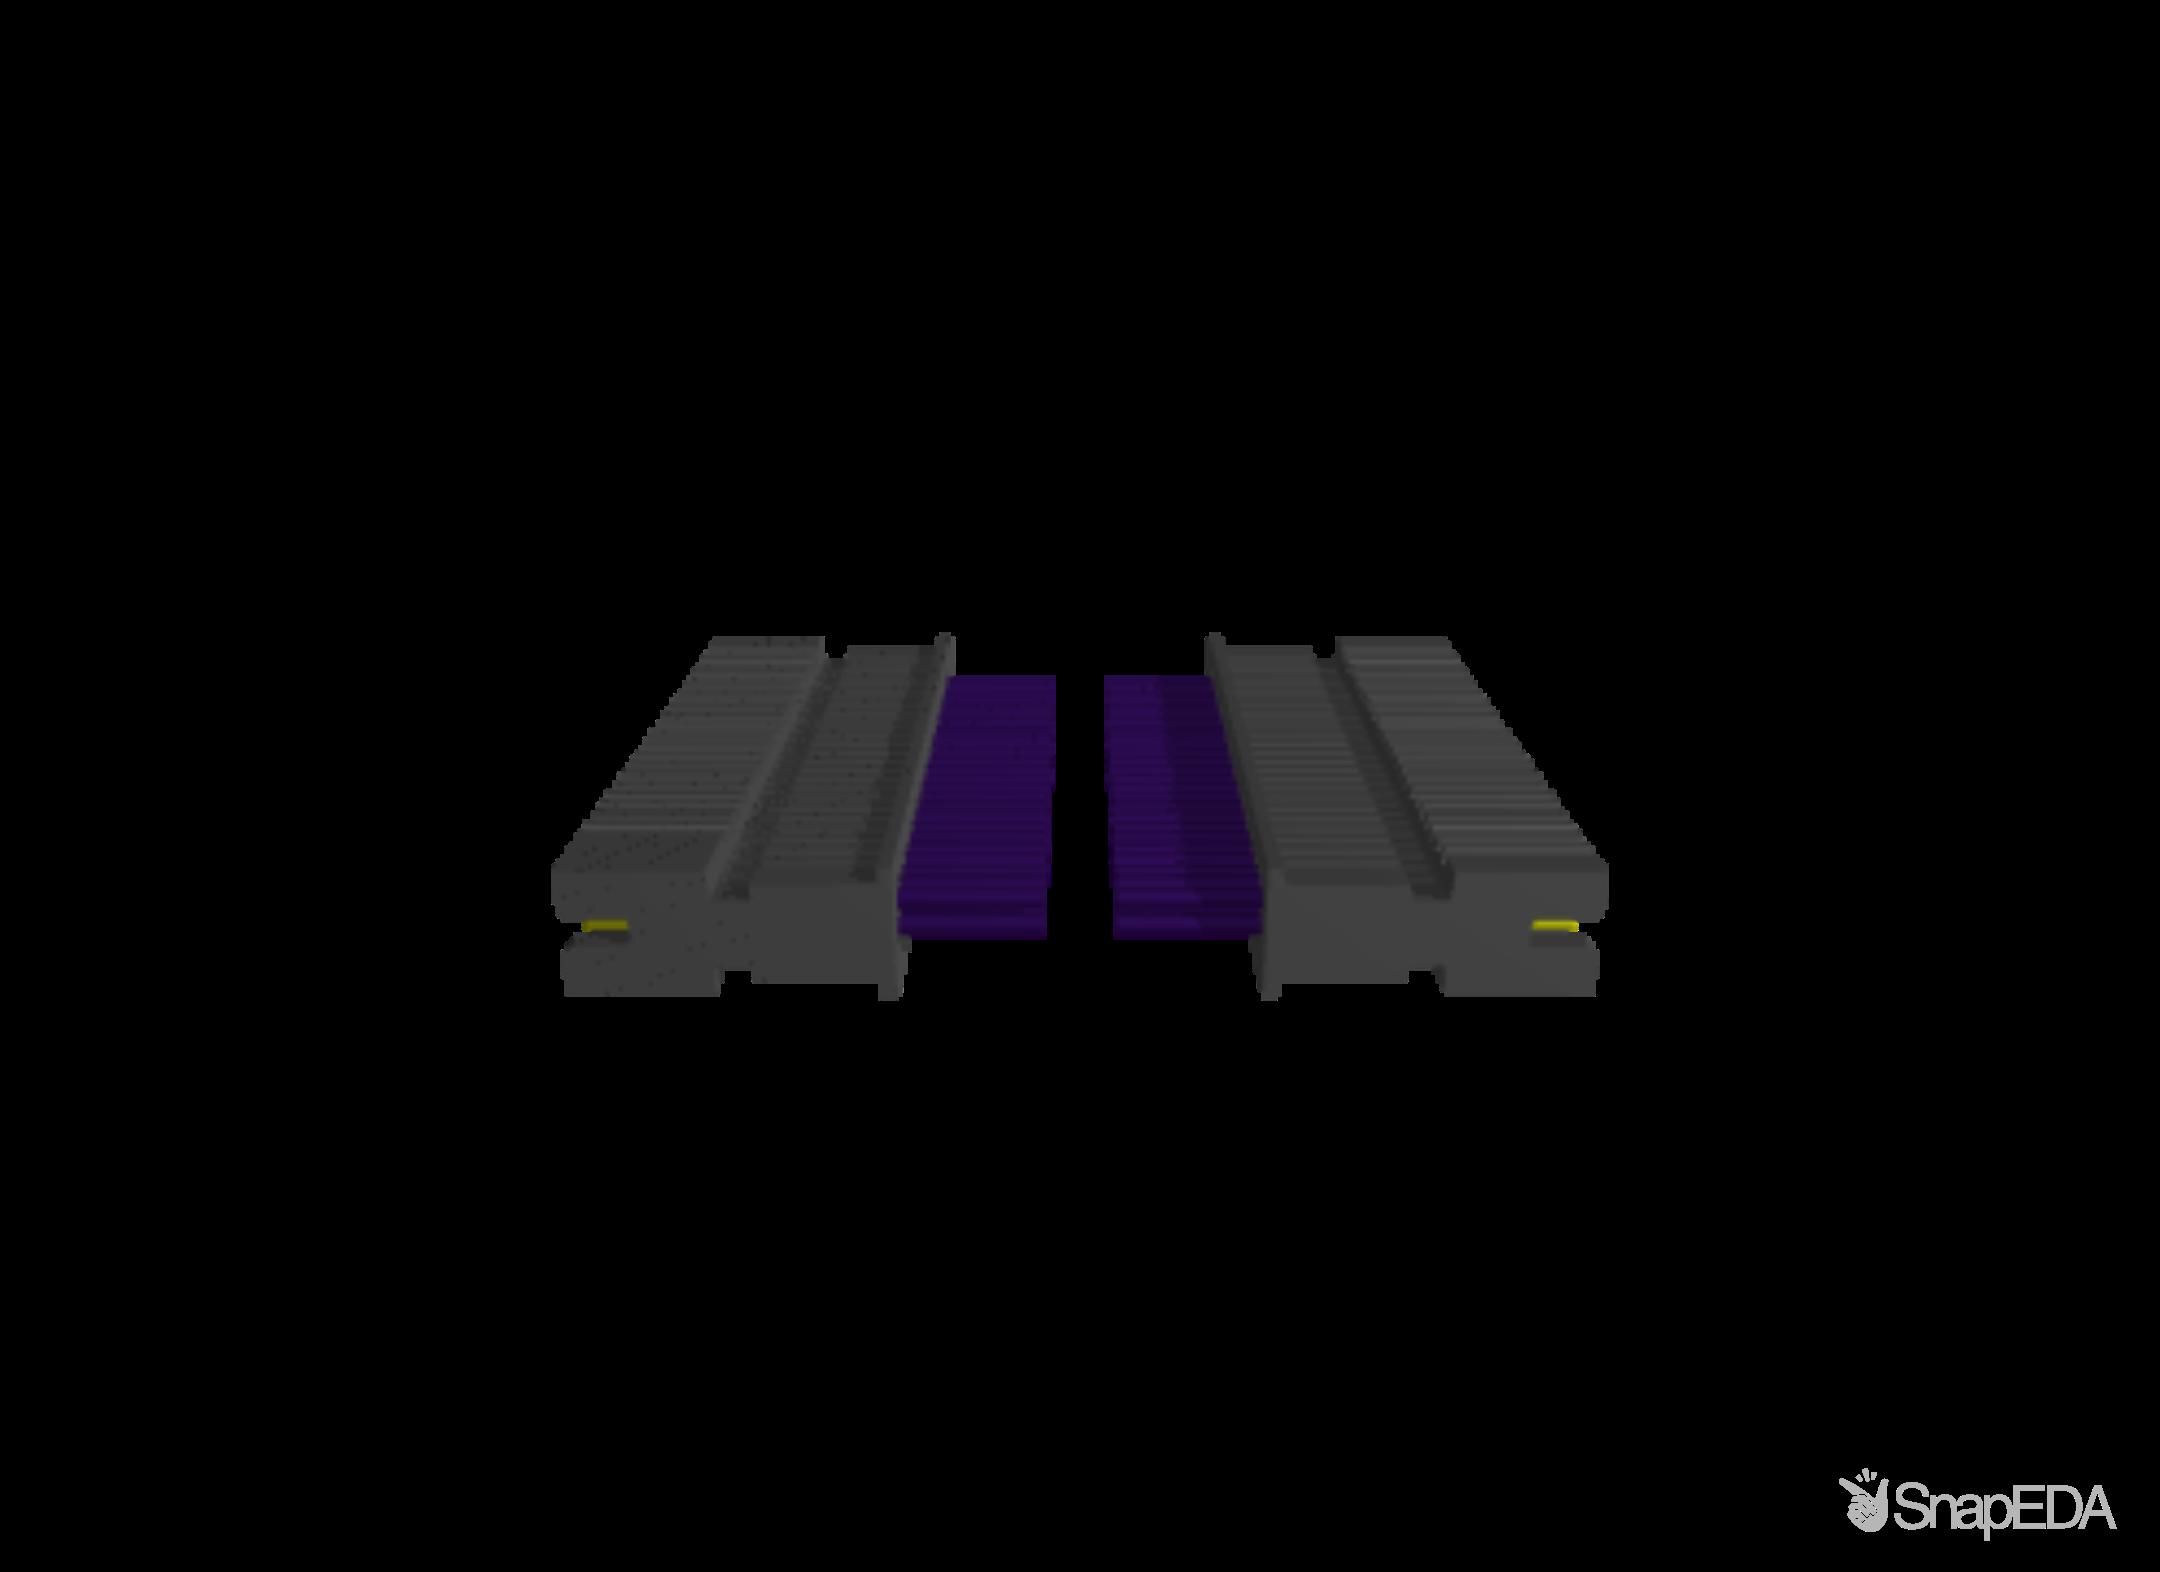 TFSD-25-28-H-06.00-D-NUX 3D Model